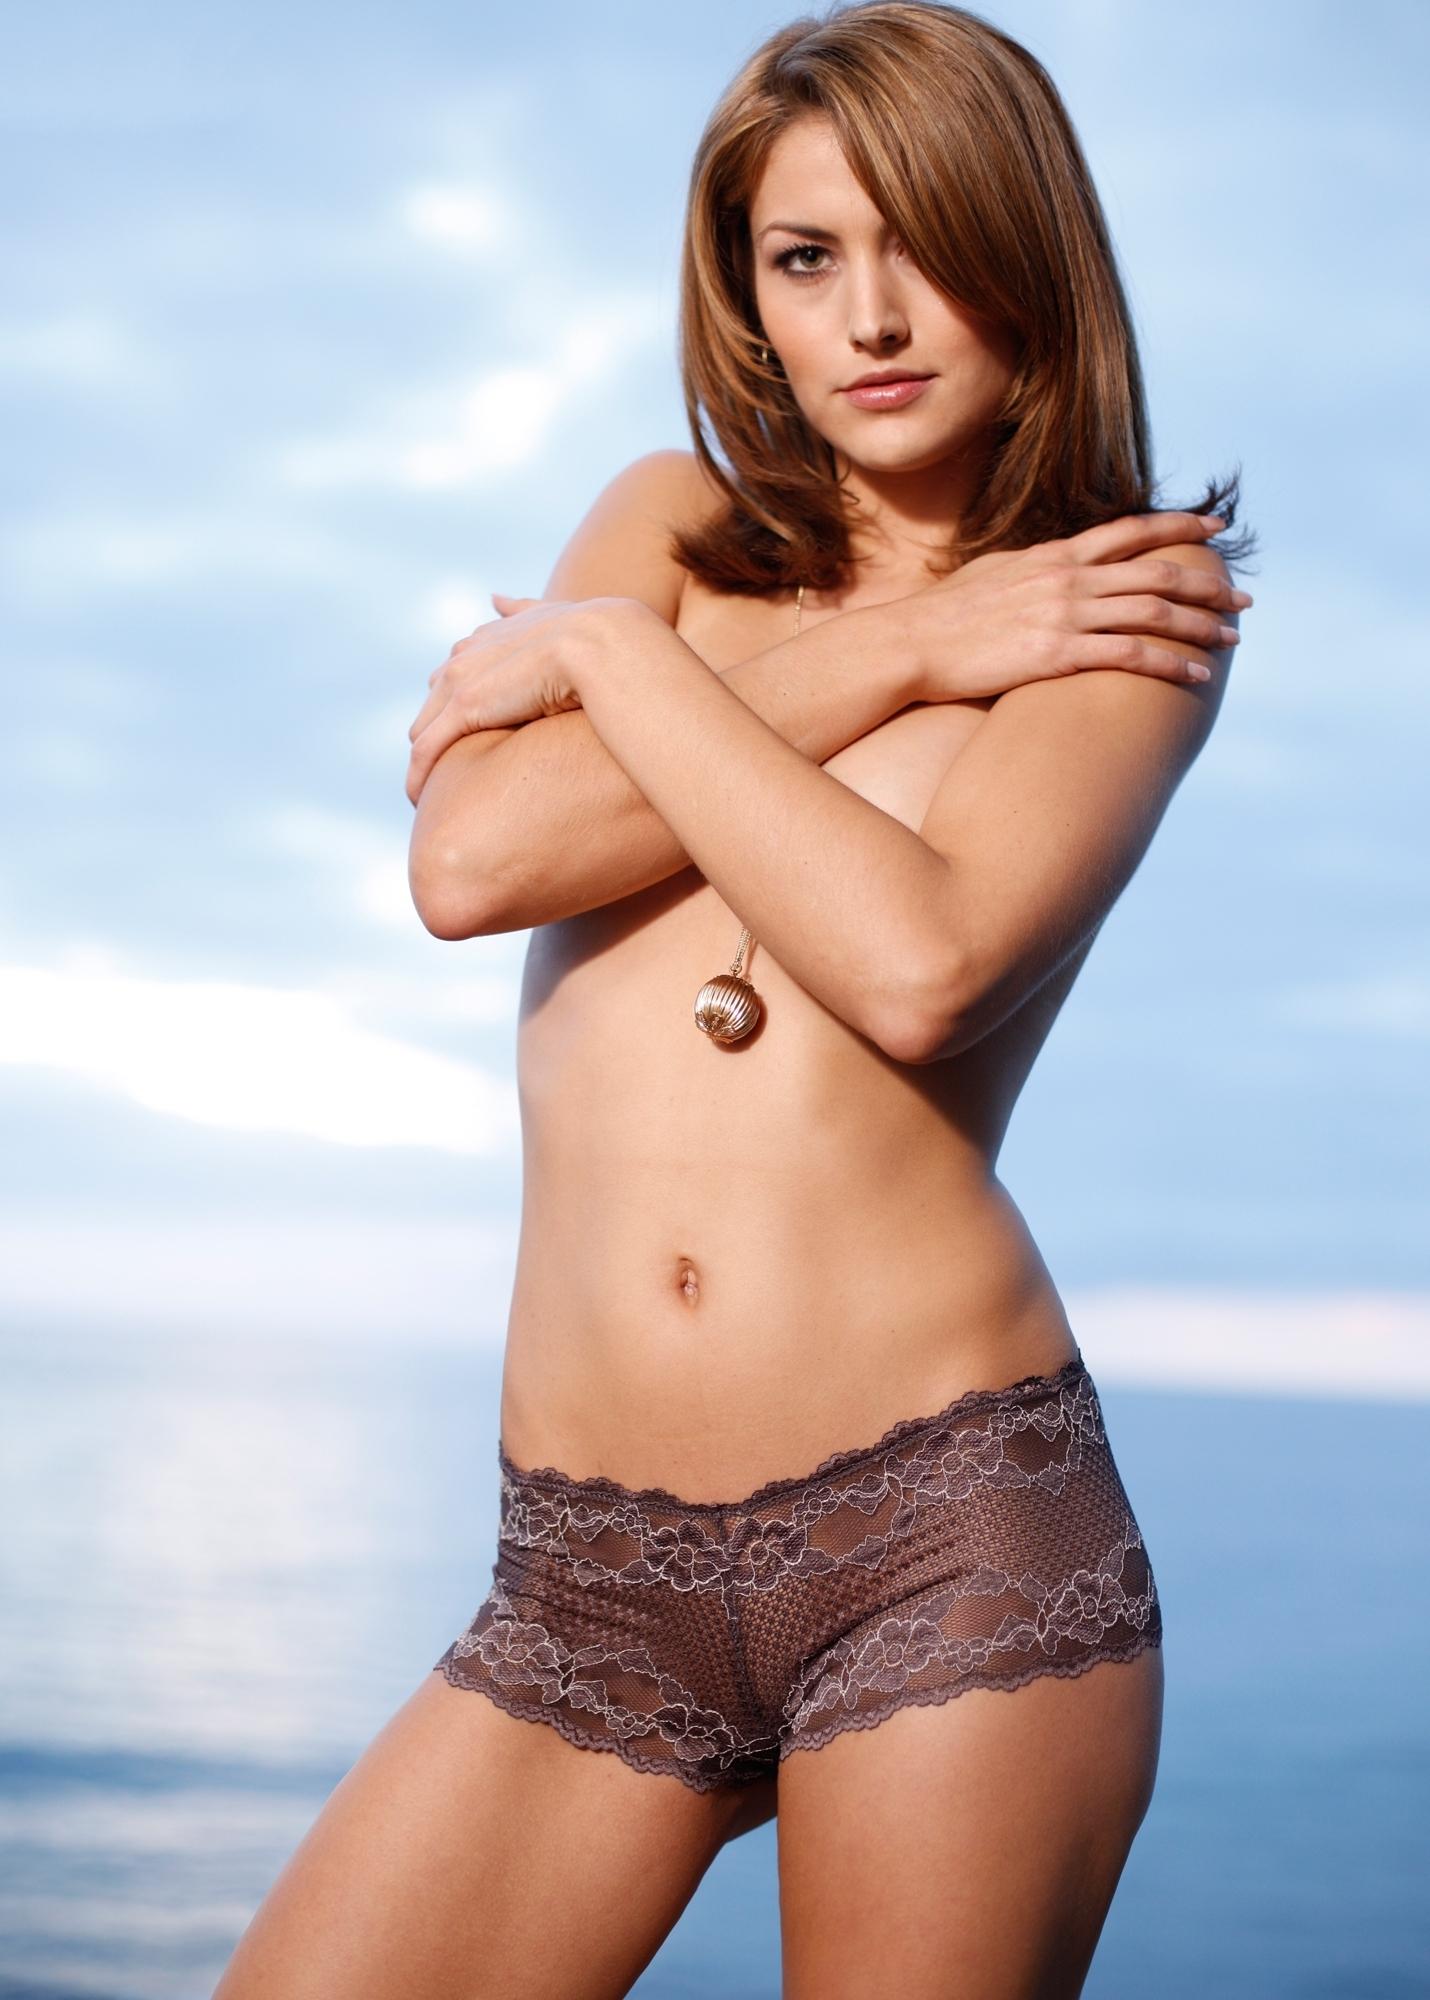 Teen Celebs Fiona Erdmann Winner Germanys Next Topmodel